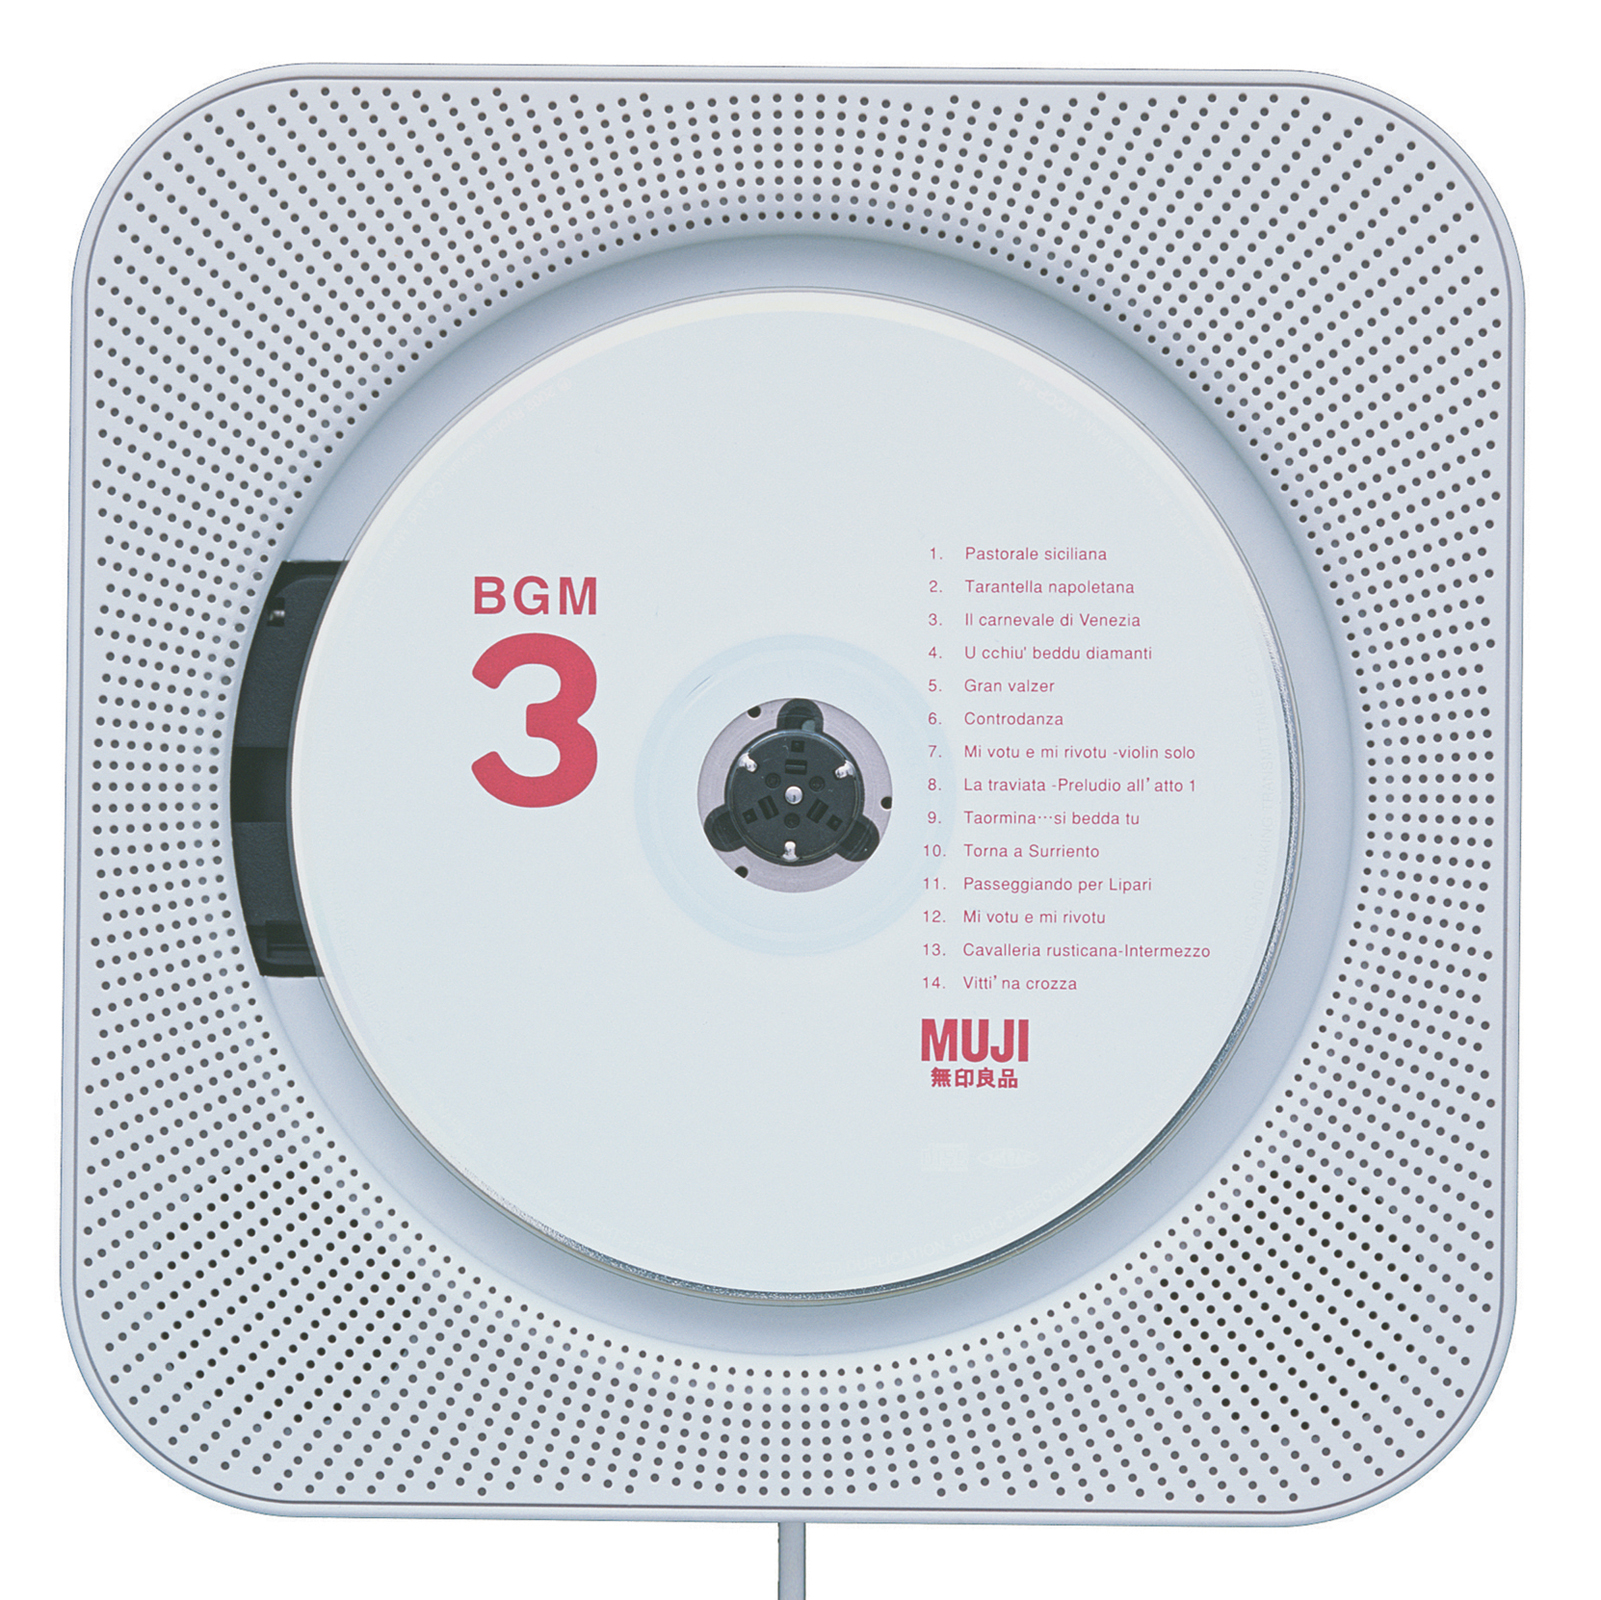 101 universal design sense and sensibility cd player